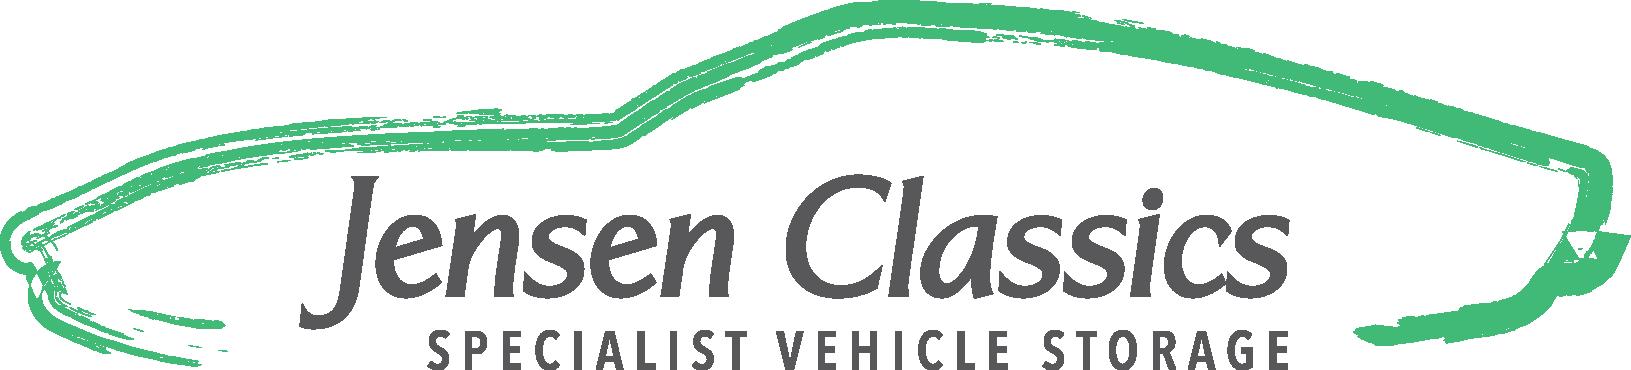 Jensen Classics